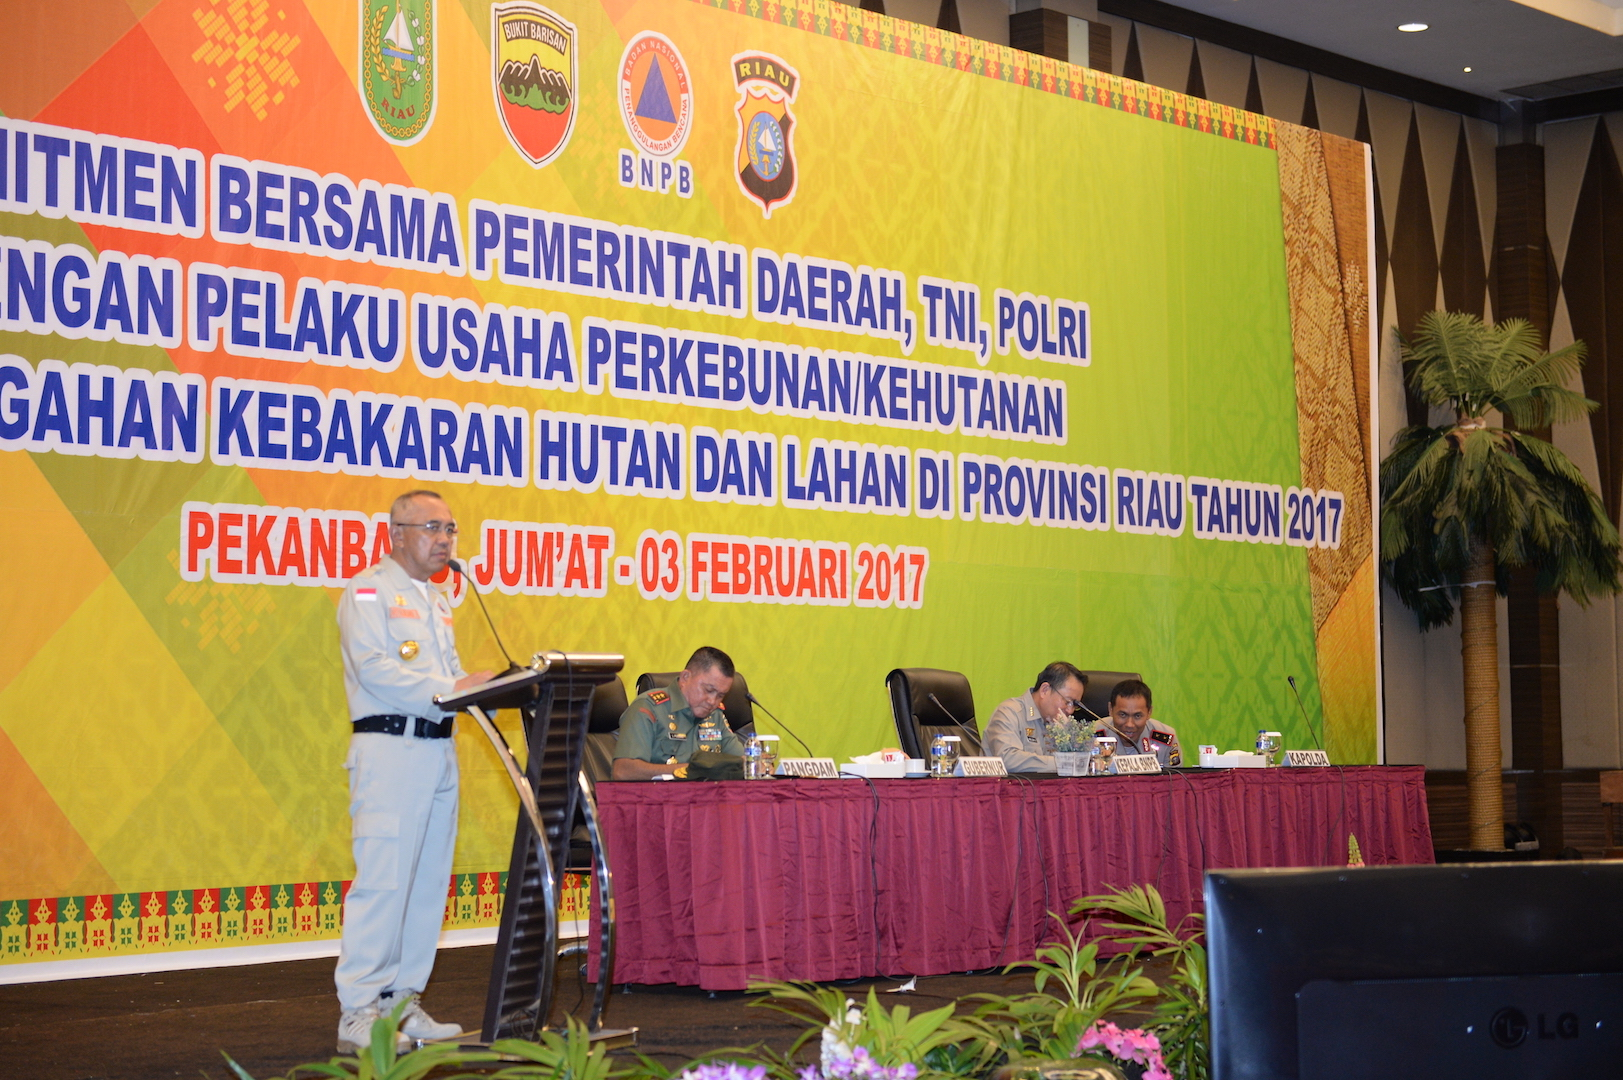 Permalink ke Komitmen Bersama Pemerintah Daerah, TNI, POLRI dengan Pelaku Usaha Perkebunan/Kehutanan